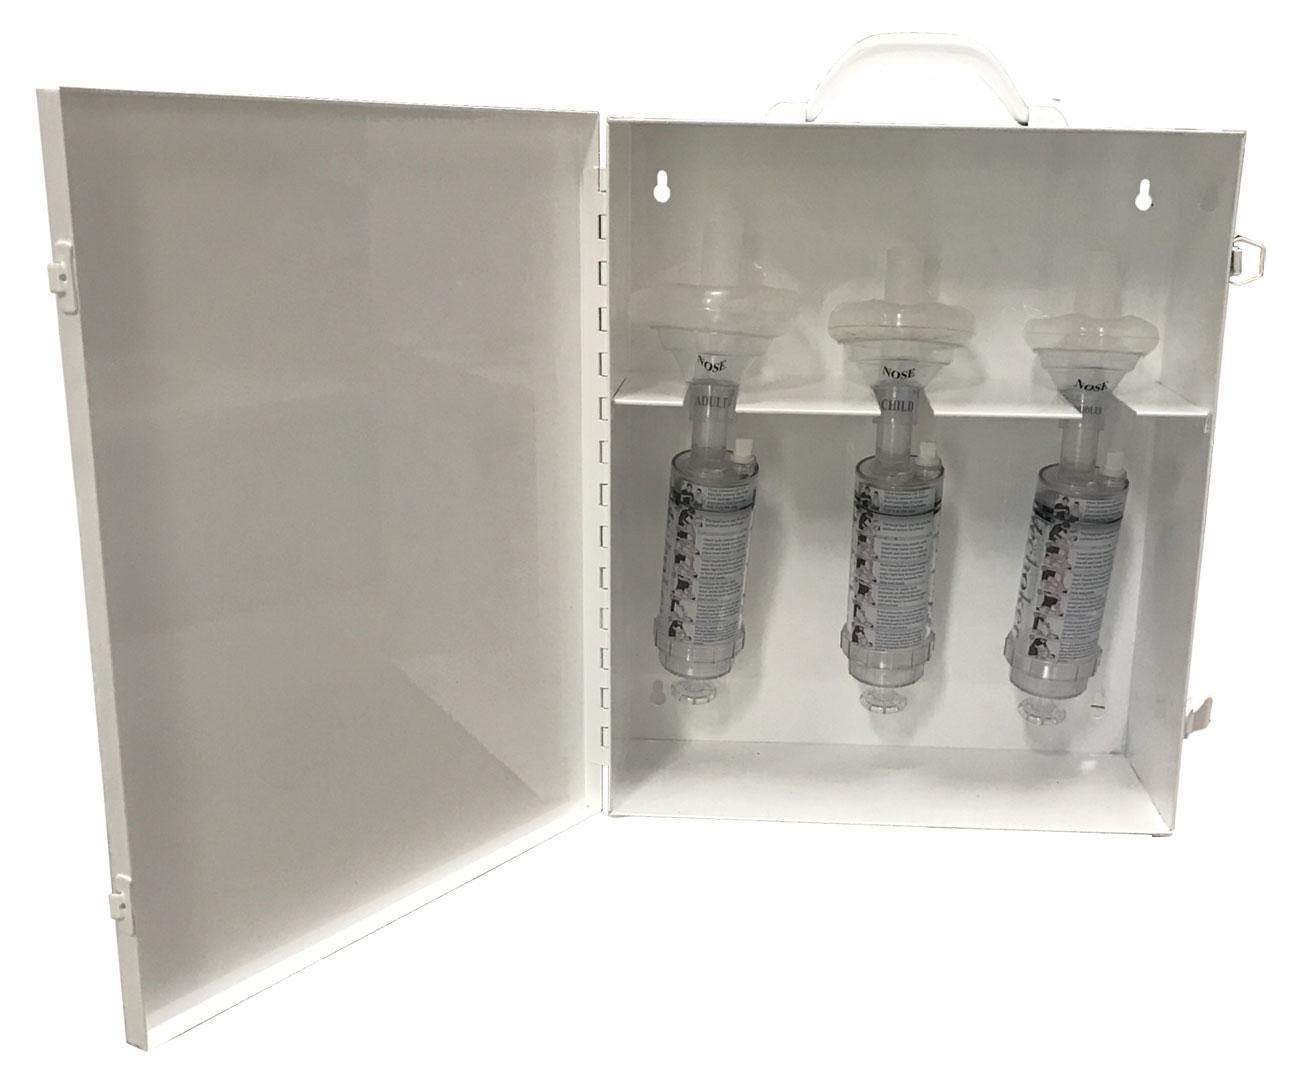 Dechoker Choking Device Wall Cabinet Kit - Adult, Child, Toddler